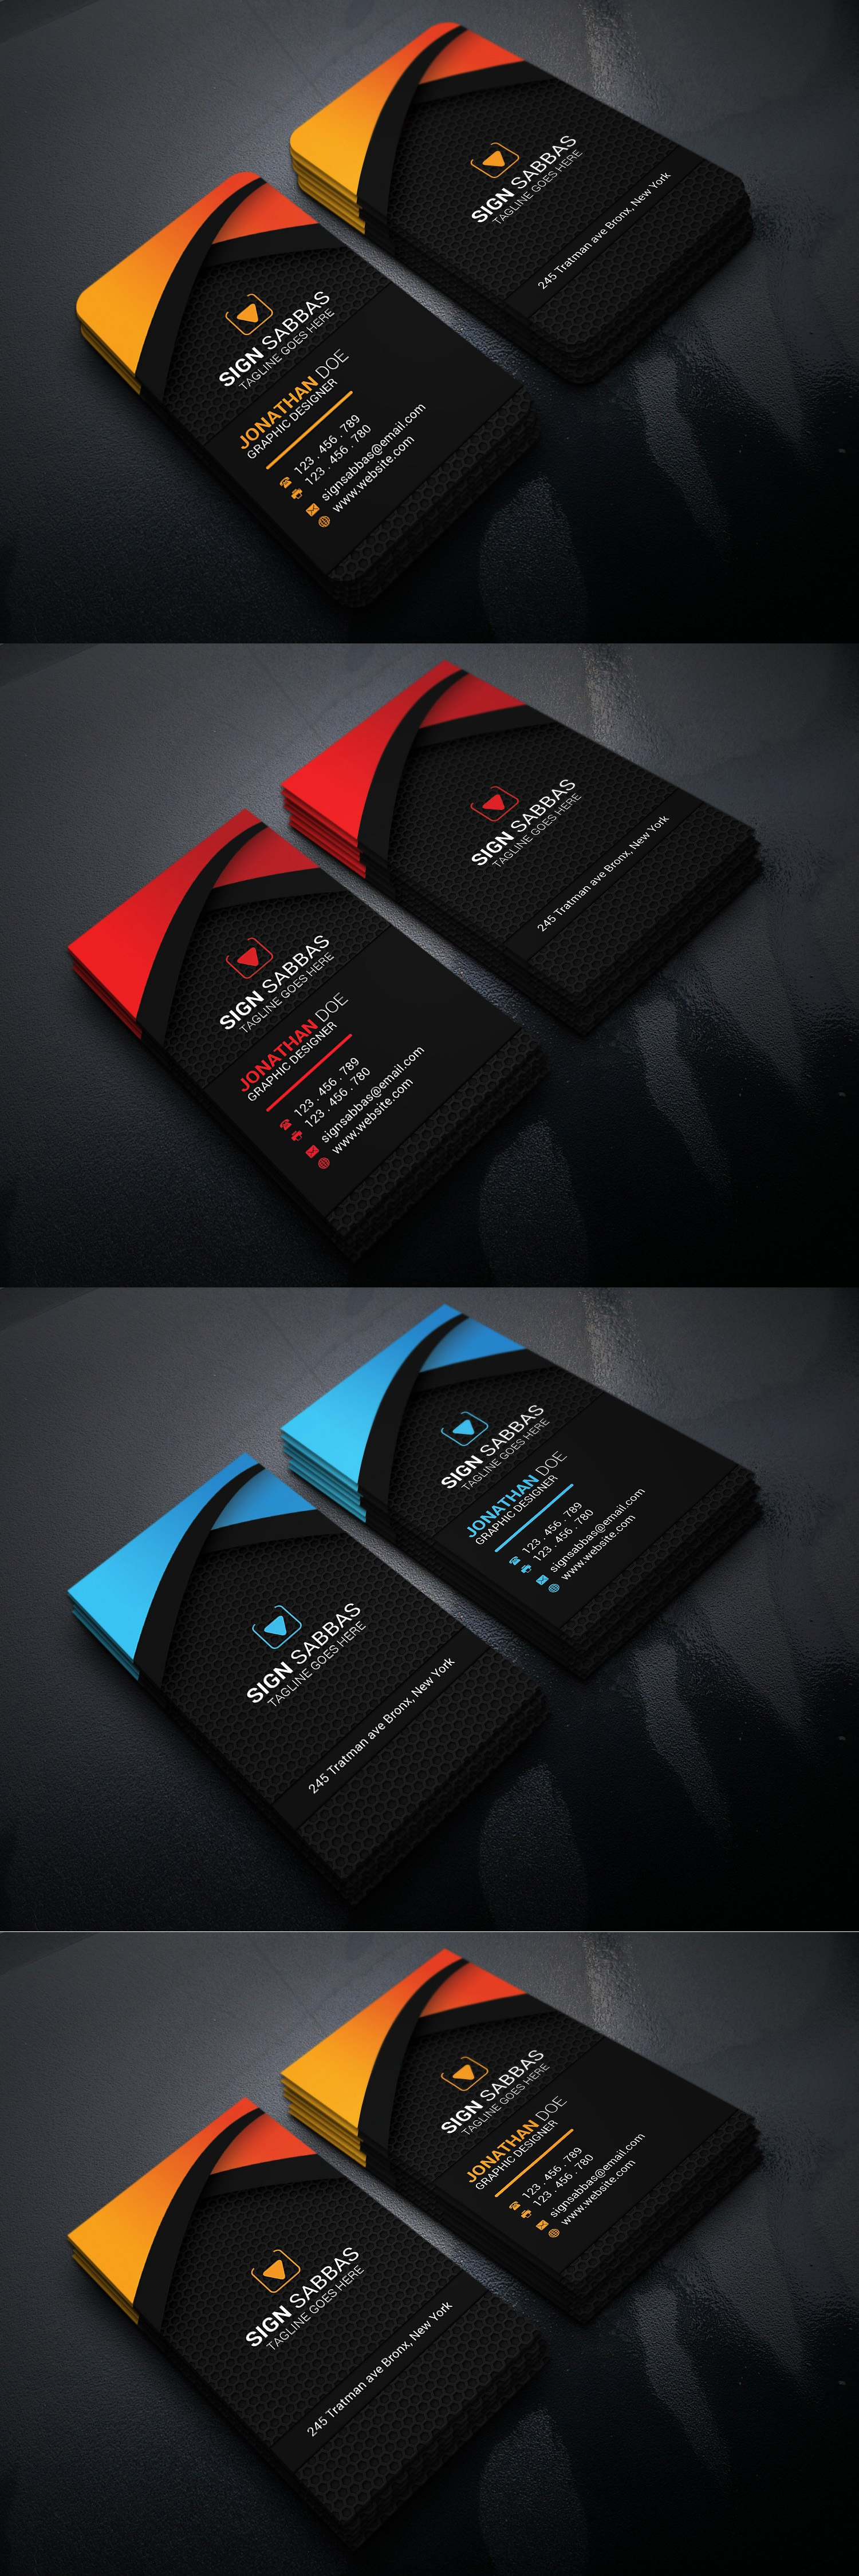 Business card templates psd business card templates pinterest business card templates psd cheaphphosting Choice Image